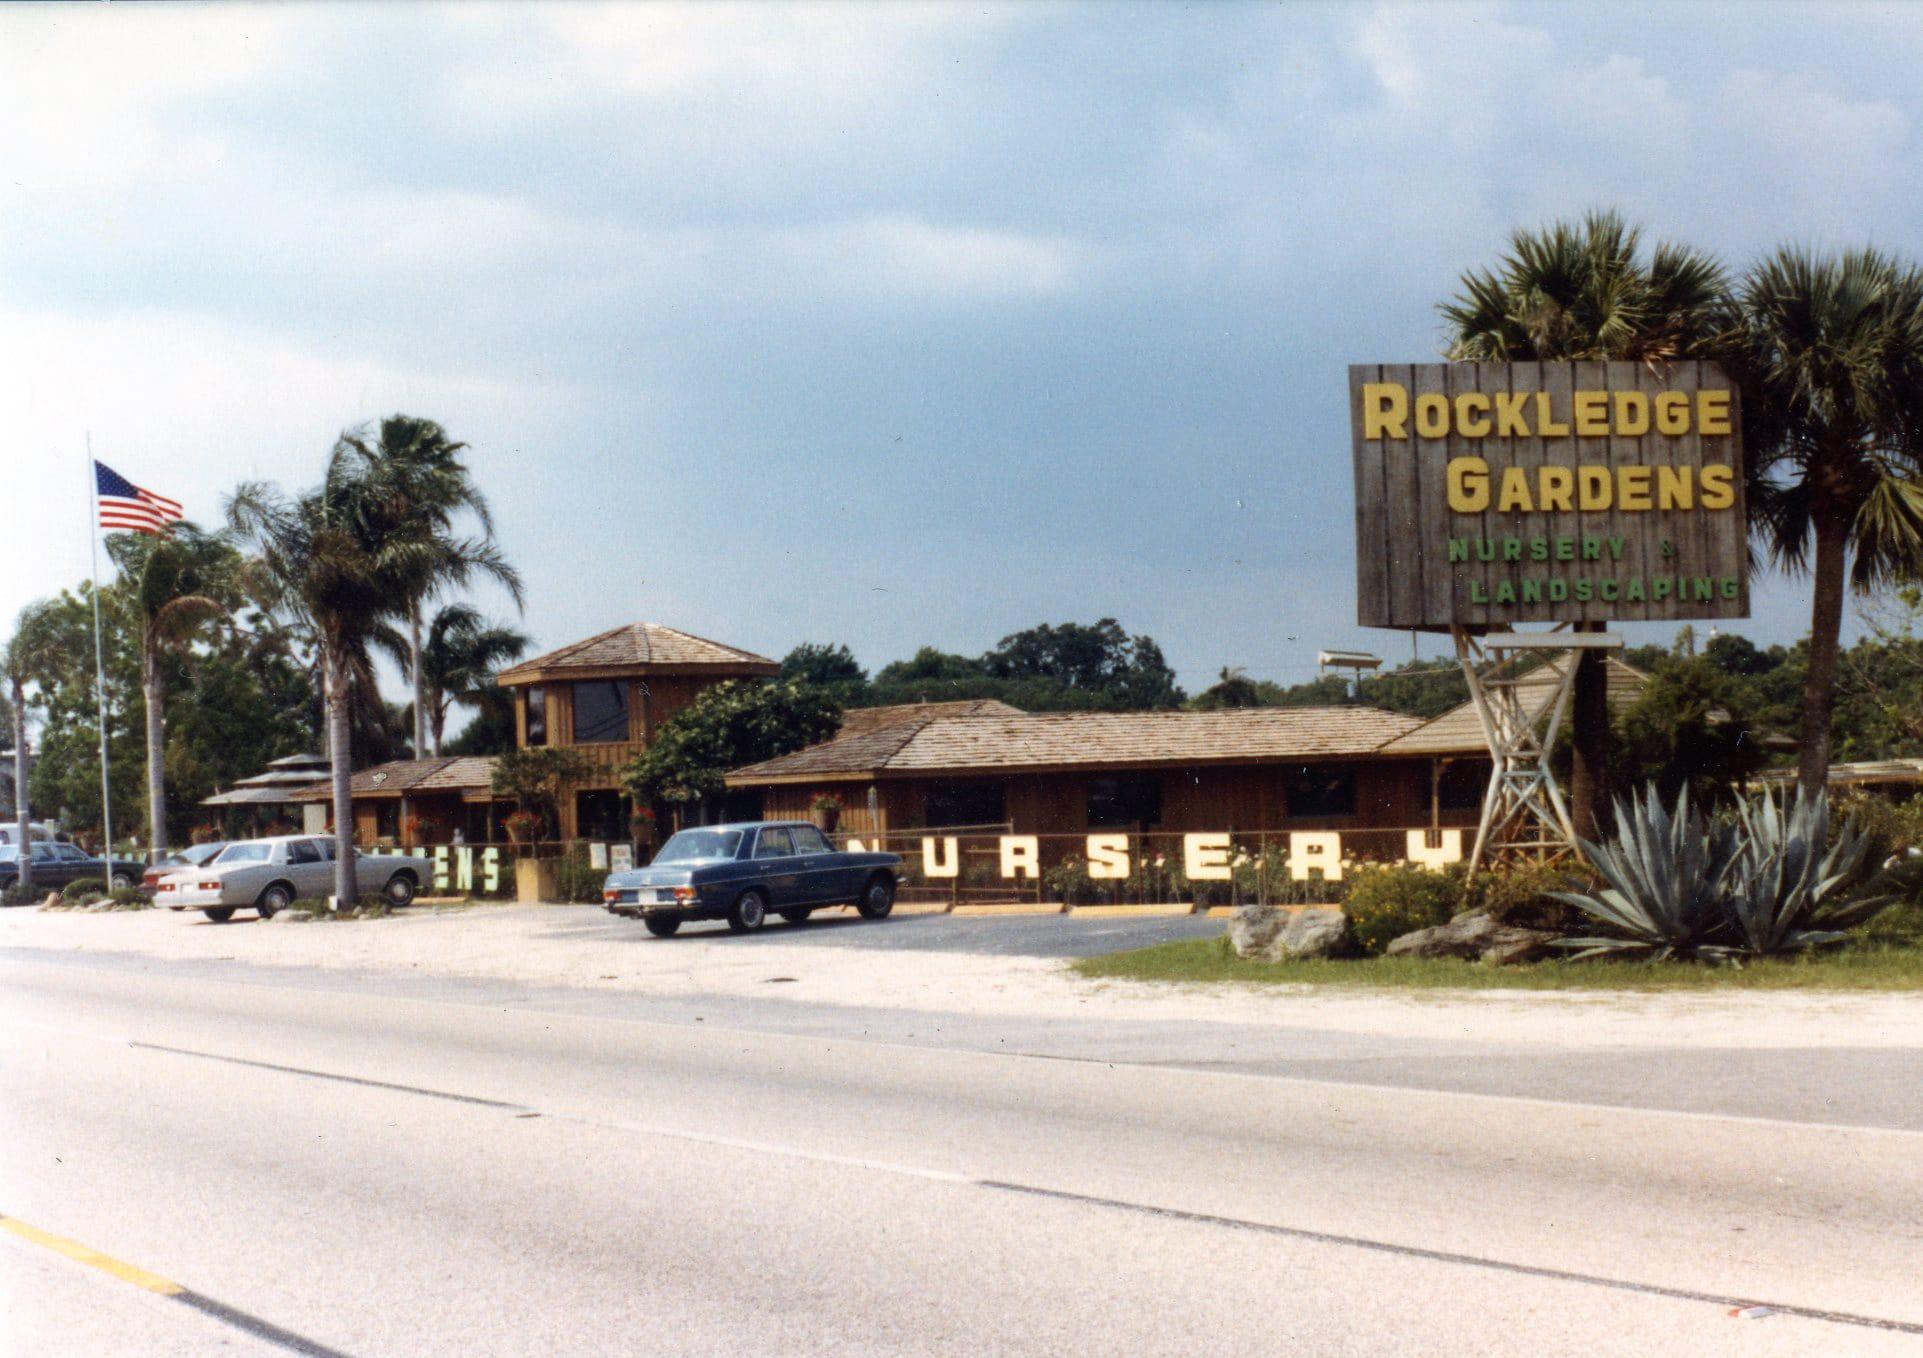 Rockledge Gardens